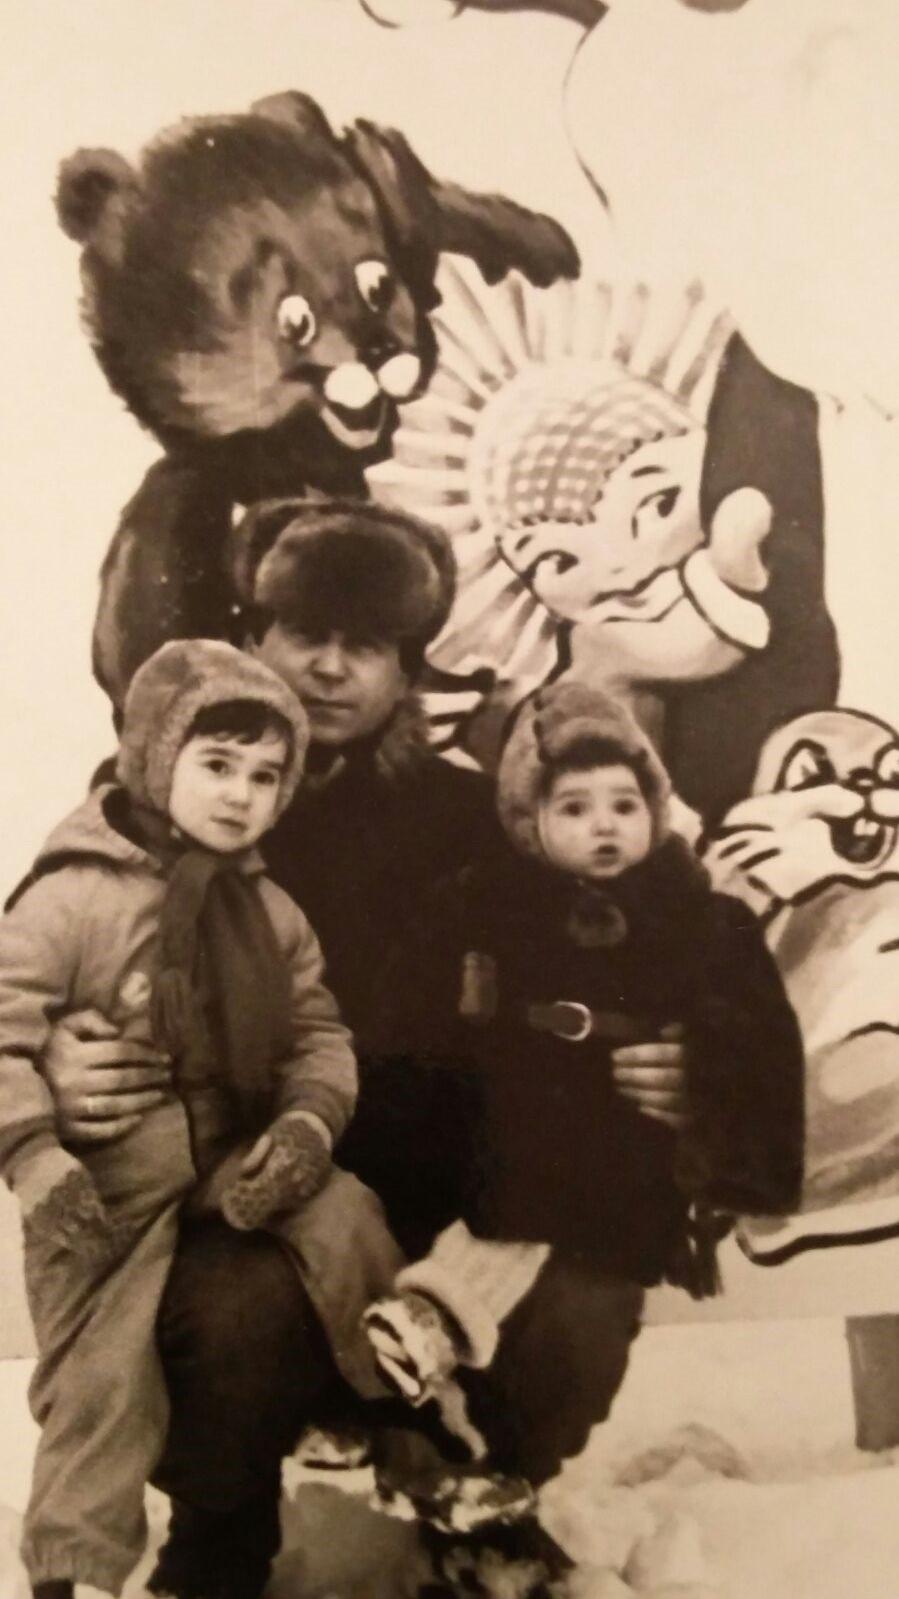 Beri Rozenberg, 1985, לטביה. אני בן שש או שבע, הילד הקטן יותר הוא בן דוד שלי ואבא שלי מאחורינו